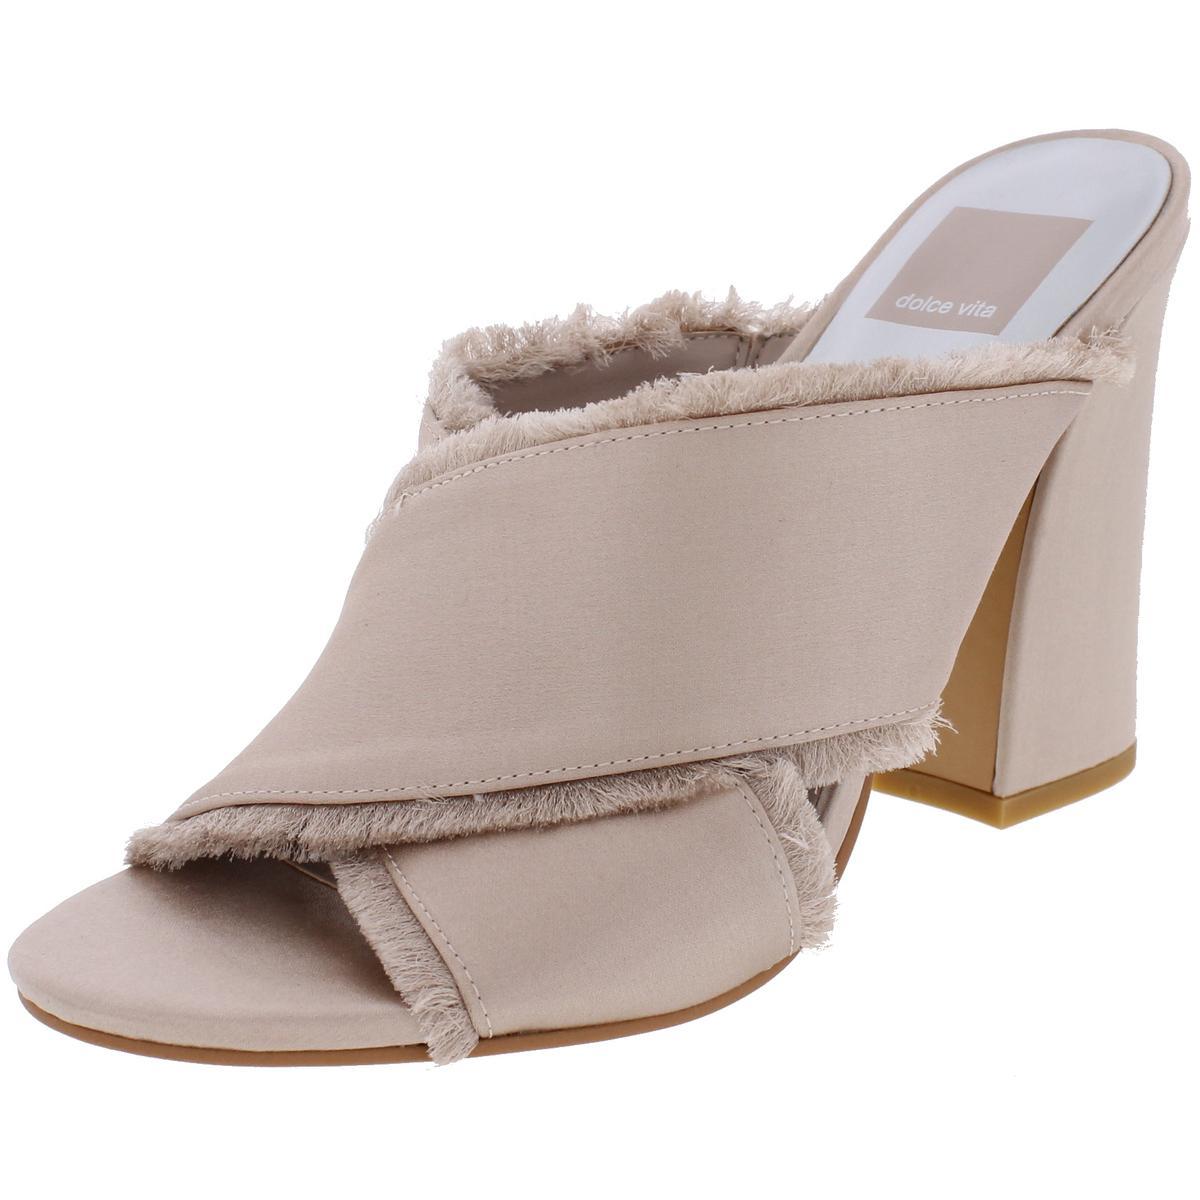 Dolce-Vita-Womens-Henry-Satin-Open-Toe-Fringe-Dress-Sandals-Shoes-BHFO-4289